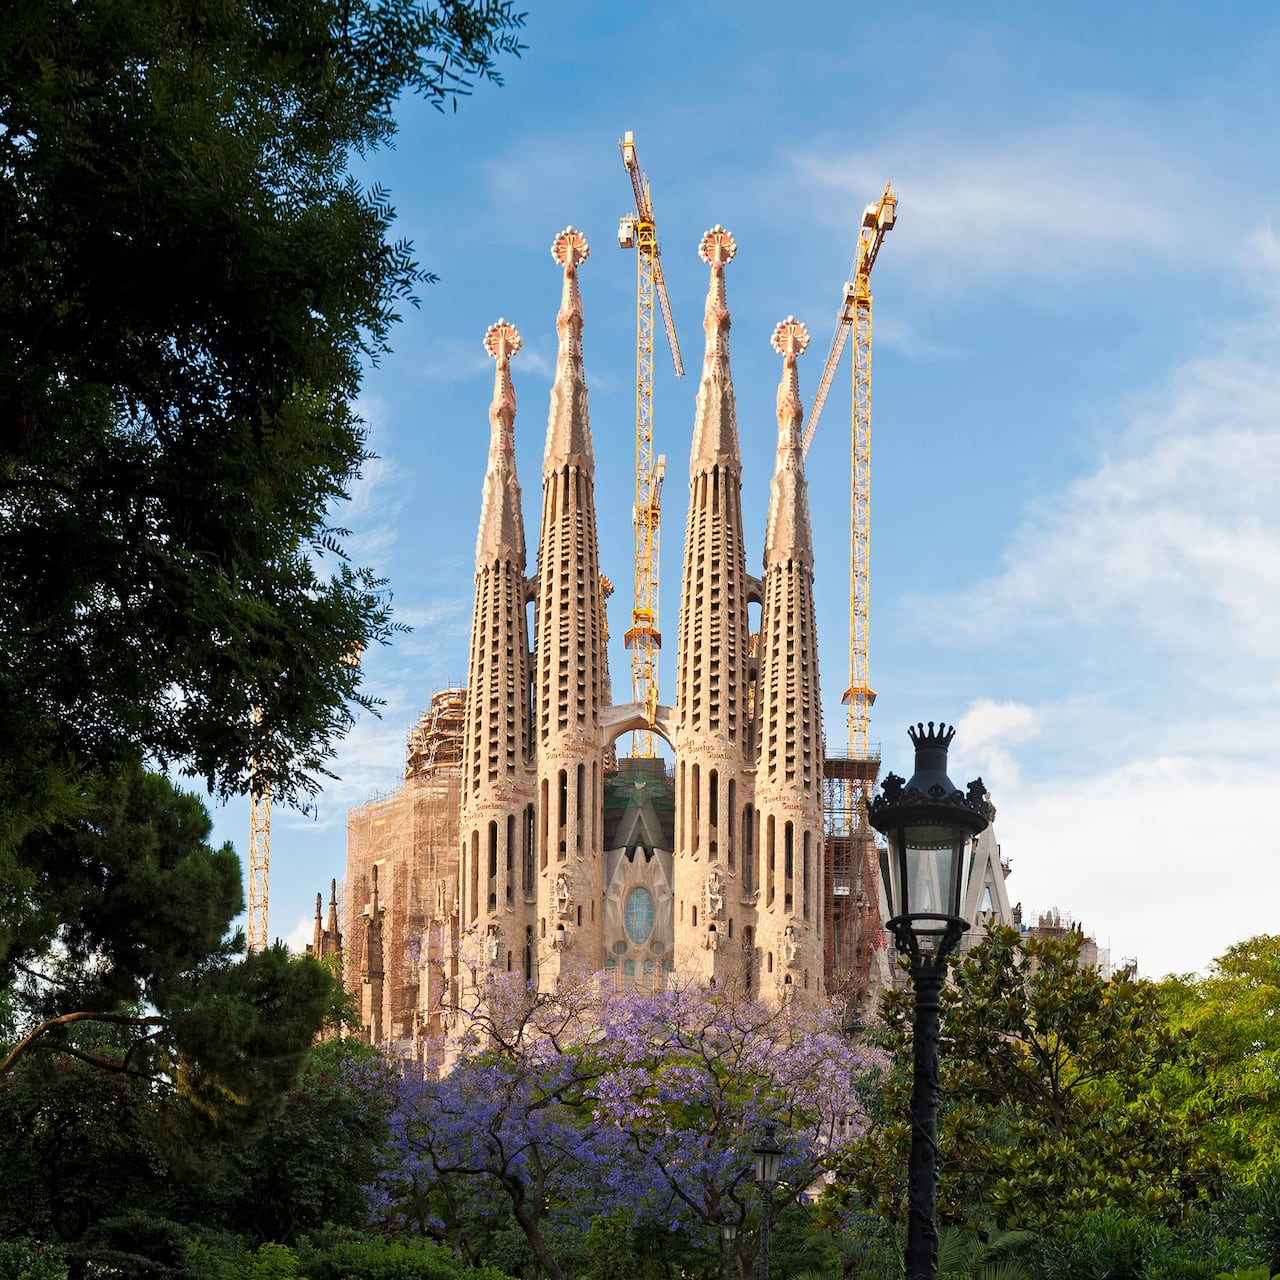 The whimsical spires of Gaudí's Sagrada Família in Barcelona loom above the treetops